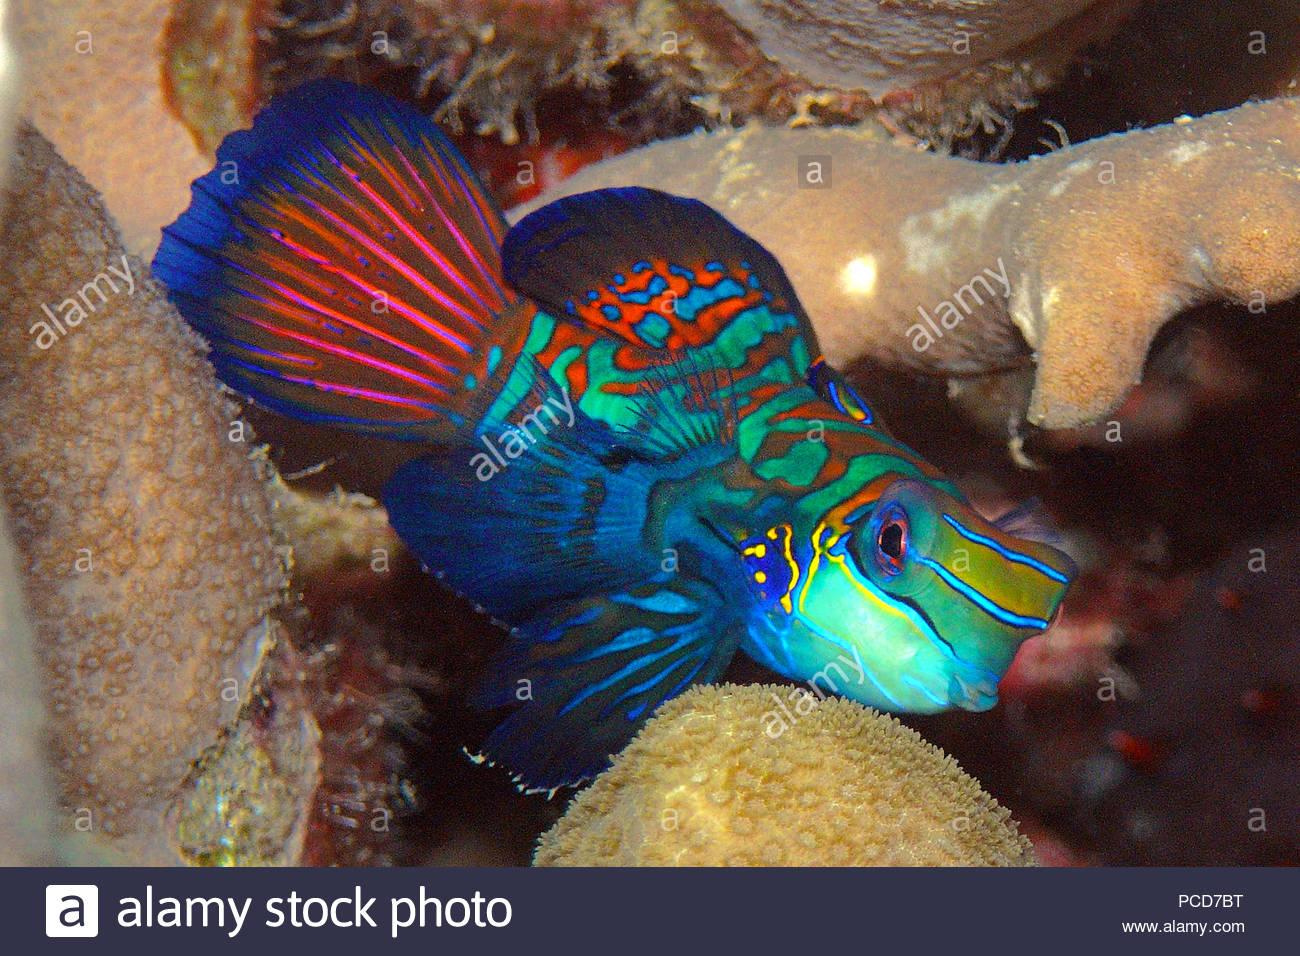 Mandarin-Leierfisch (Synchiropus splendidus), Yap, Mikronesien | Mandarinfish or mandarin dragonet (Synchiropus splendidus), Yap islands Micronesia - Stock Image